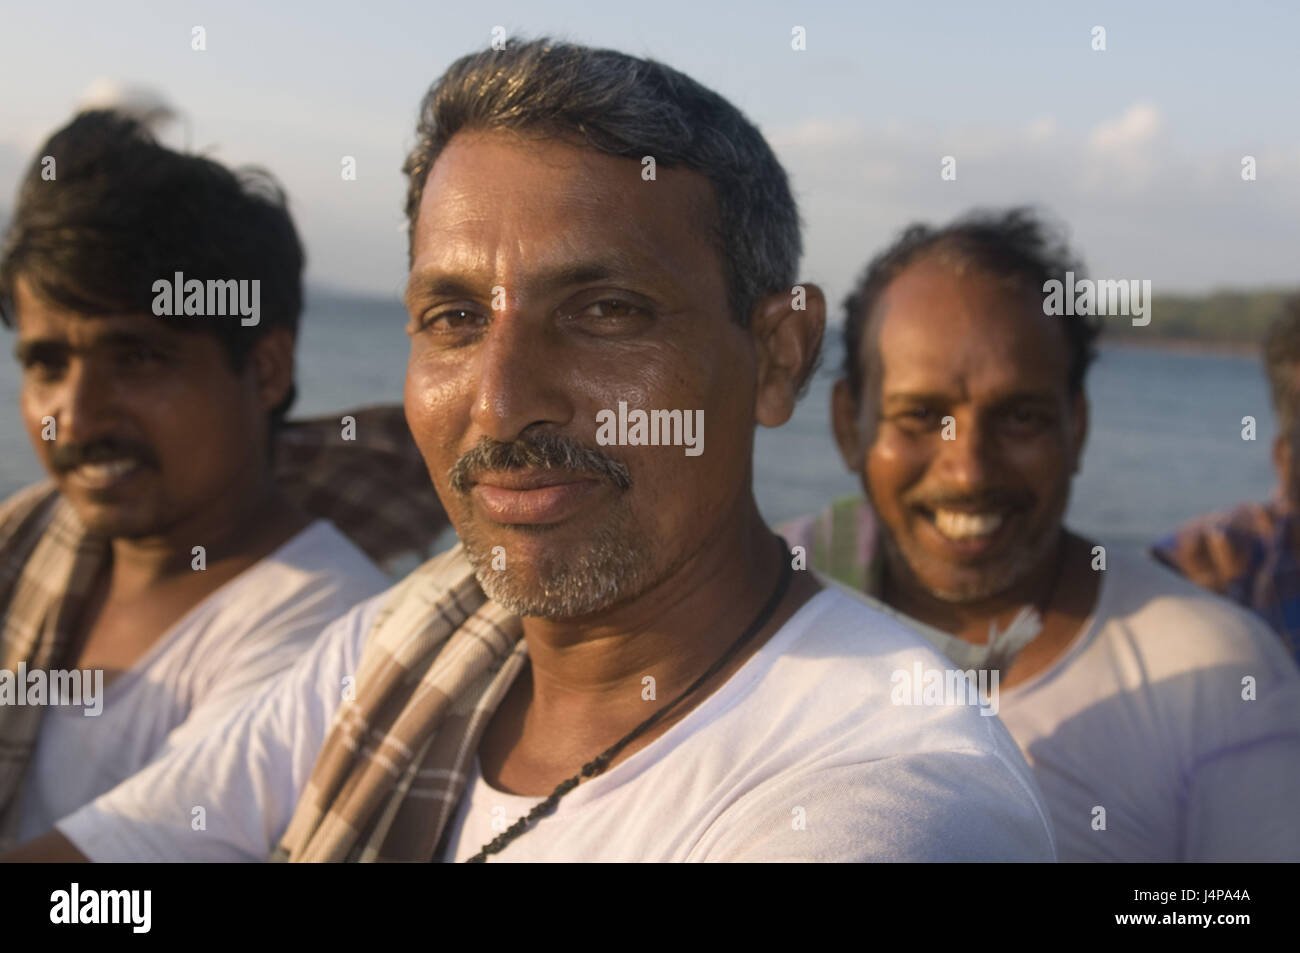 Men, smile, portrait, port Blair, Andamanen, India, no model release, - Stock Image